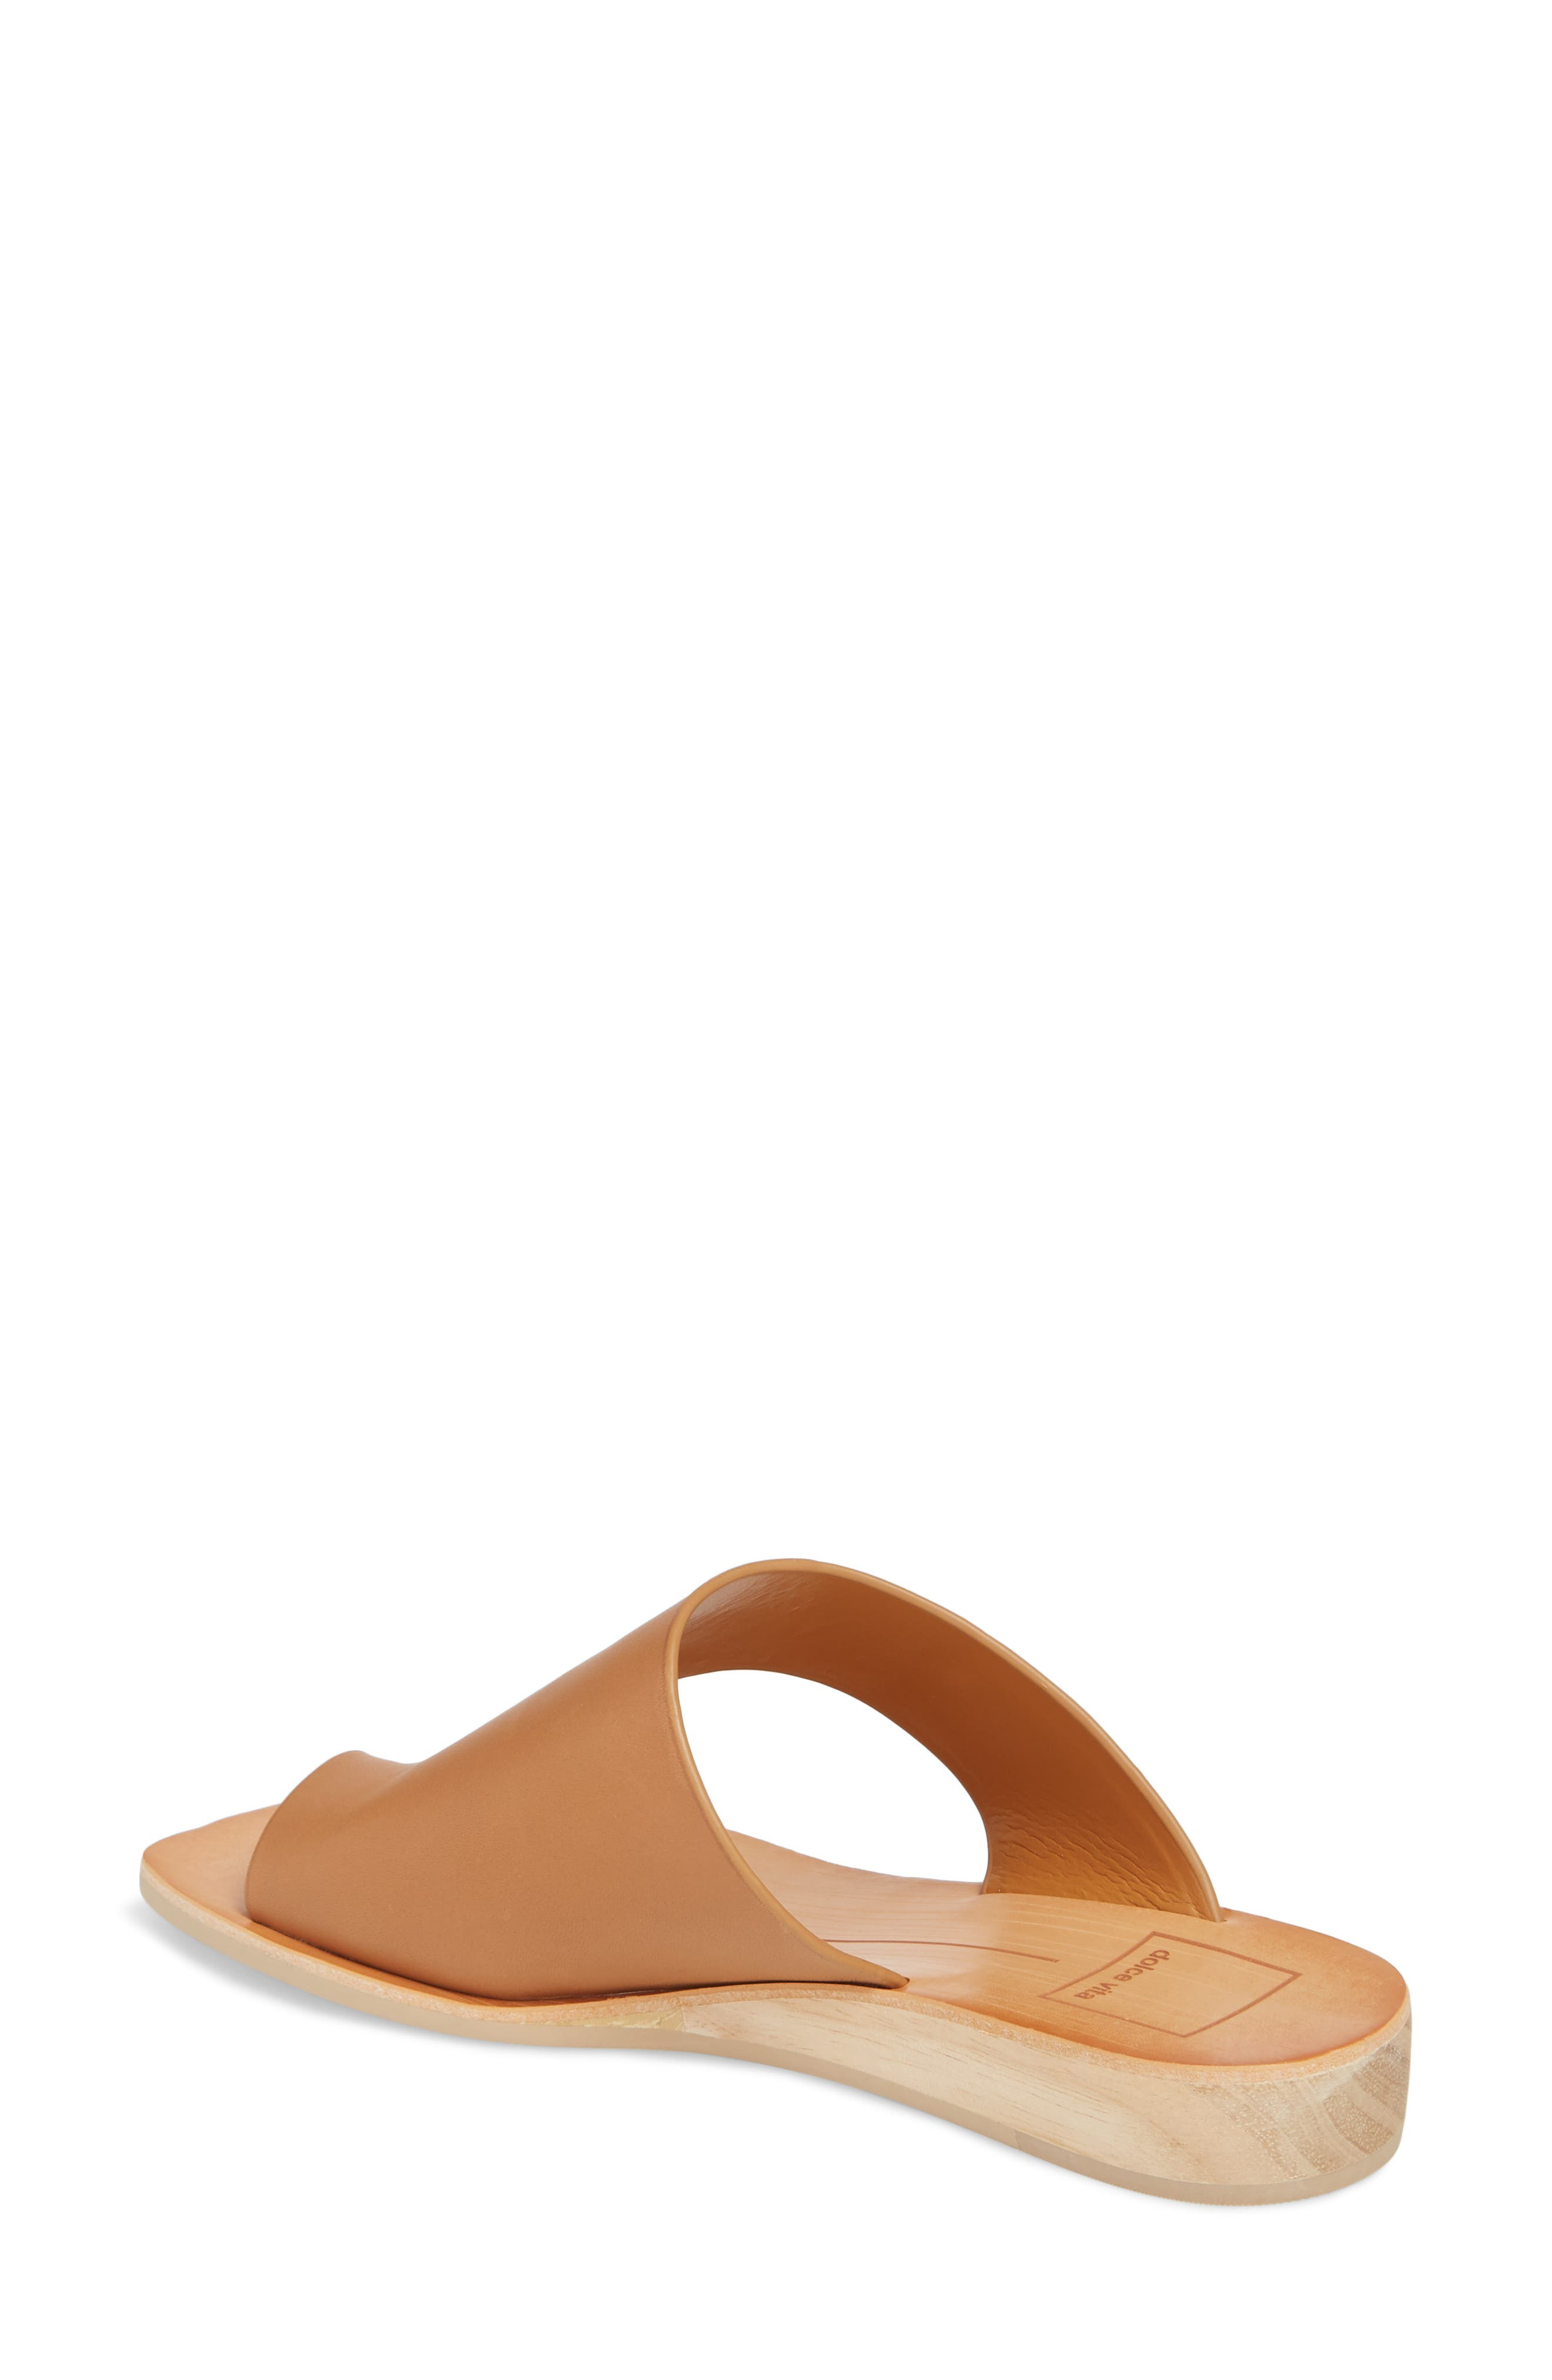 Hazle Genuine Calf Hair Sandal,                             Alternate thumbnail 5, color,